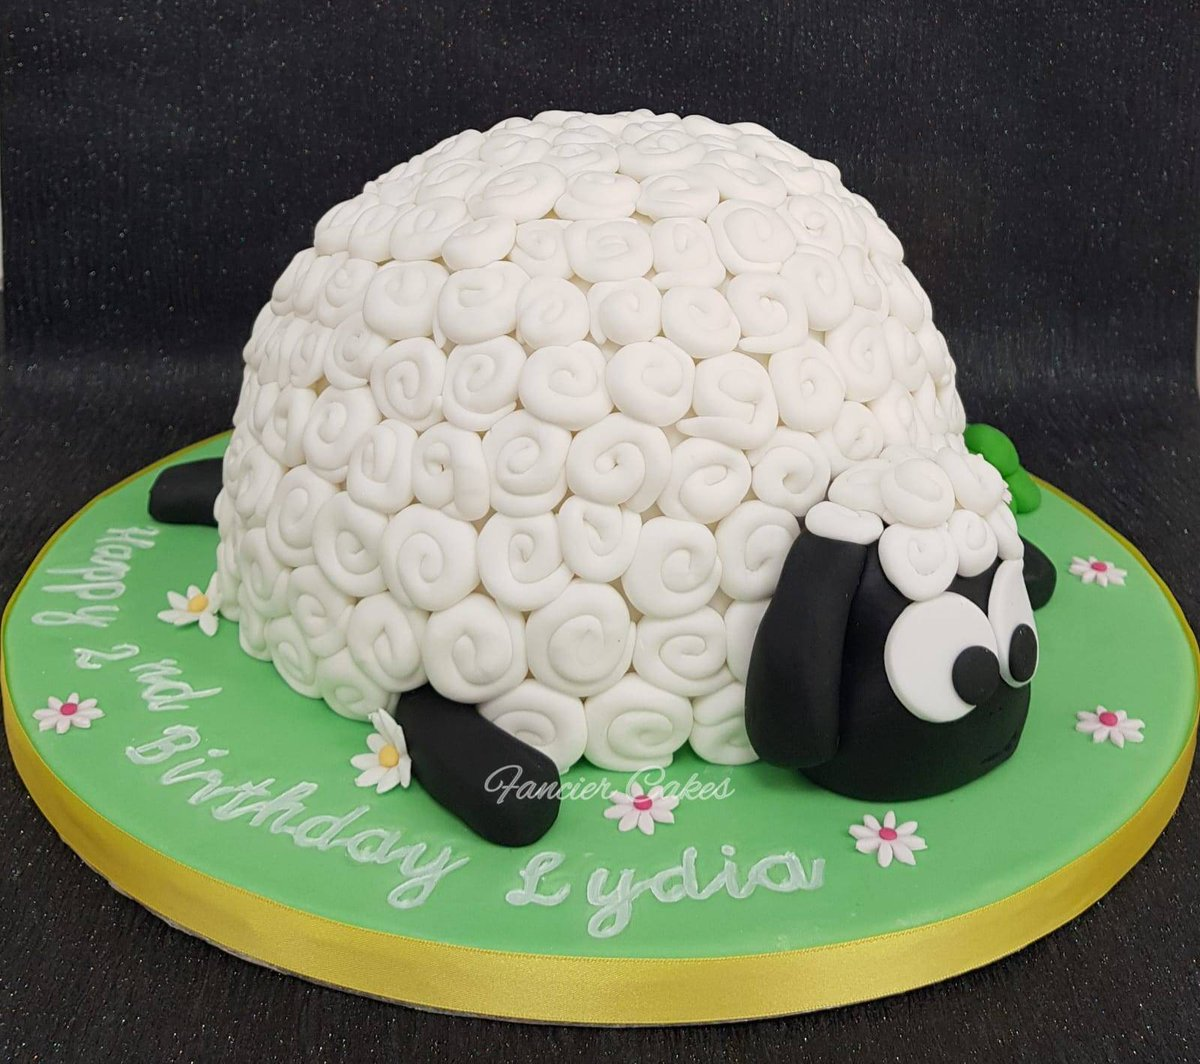 Fancier Cakes On Twitter Baa Baa Black Sheep Have You Any Wool